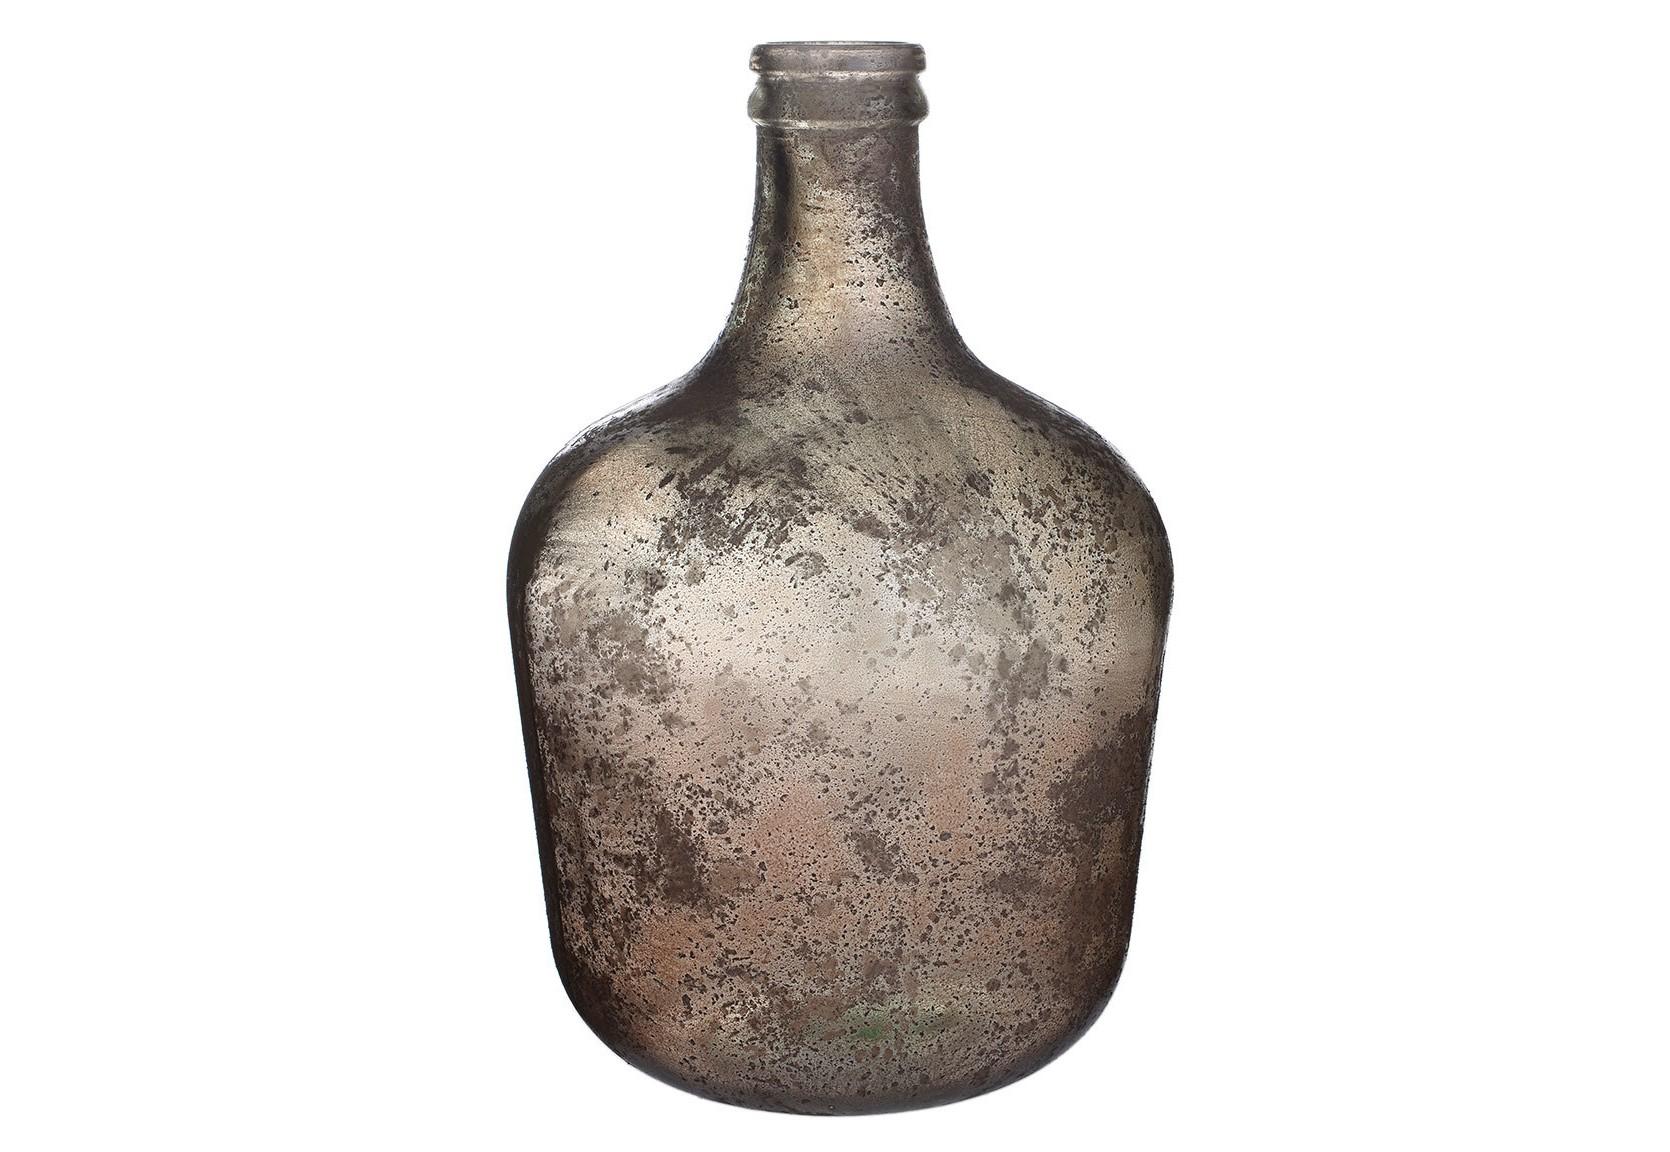 Бутыль Comodoro RivadaviaБанки и бутылки<br><br><br>Material: Стекло<br>Length см: None<br>Width см: None<br>Height см: 42<br>Diameter см: 27